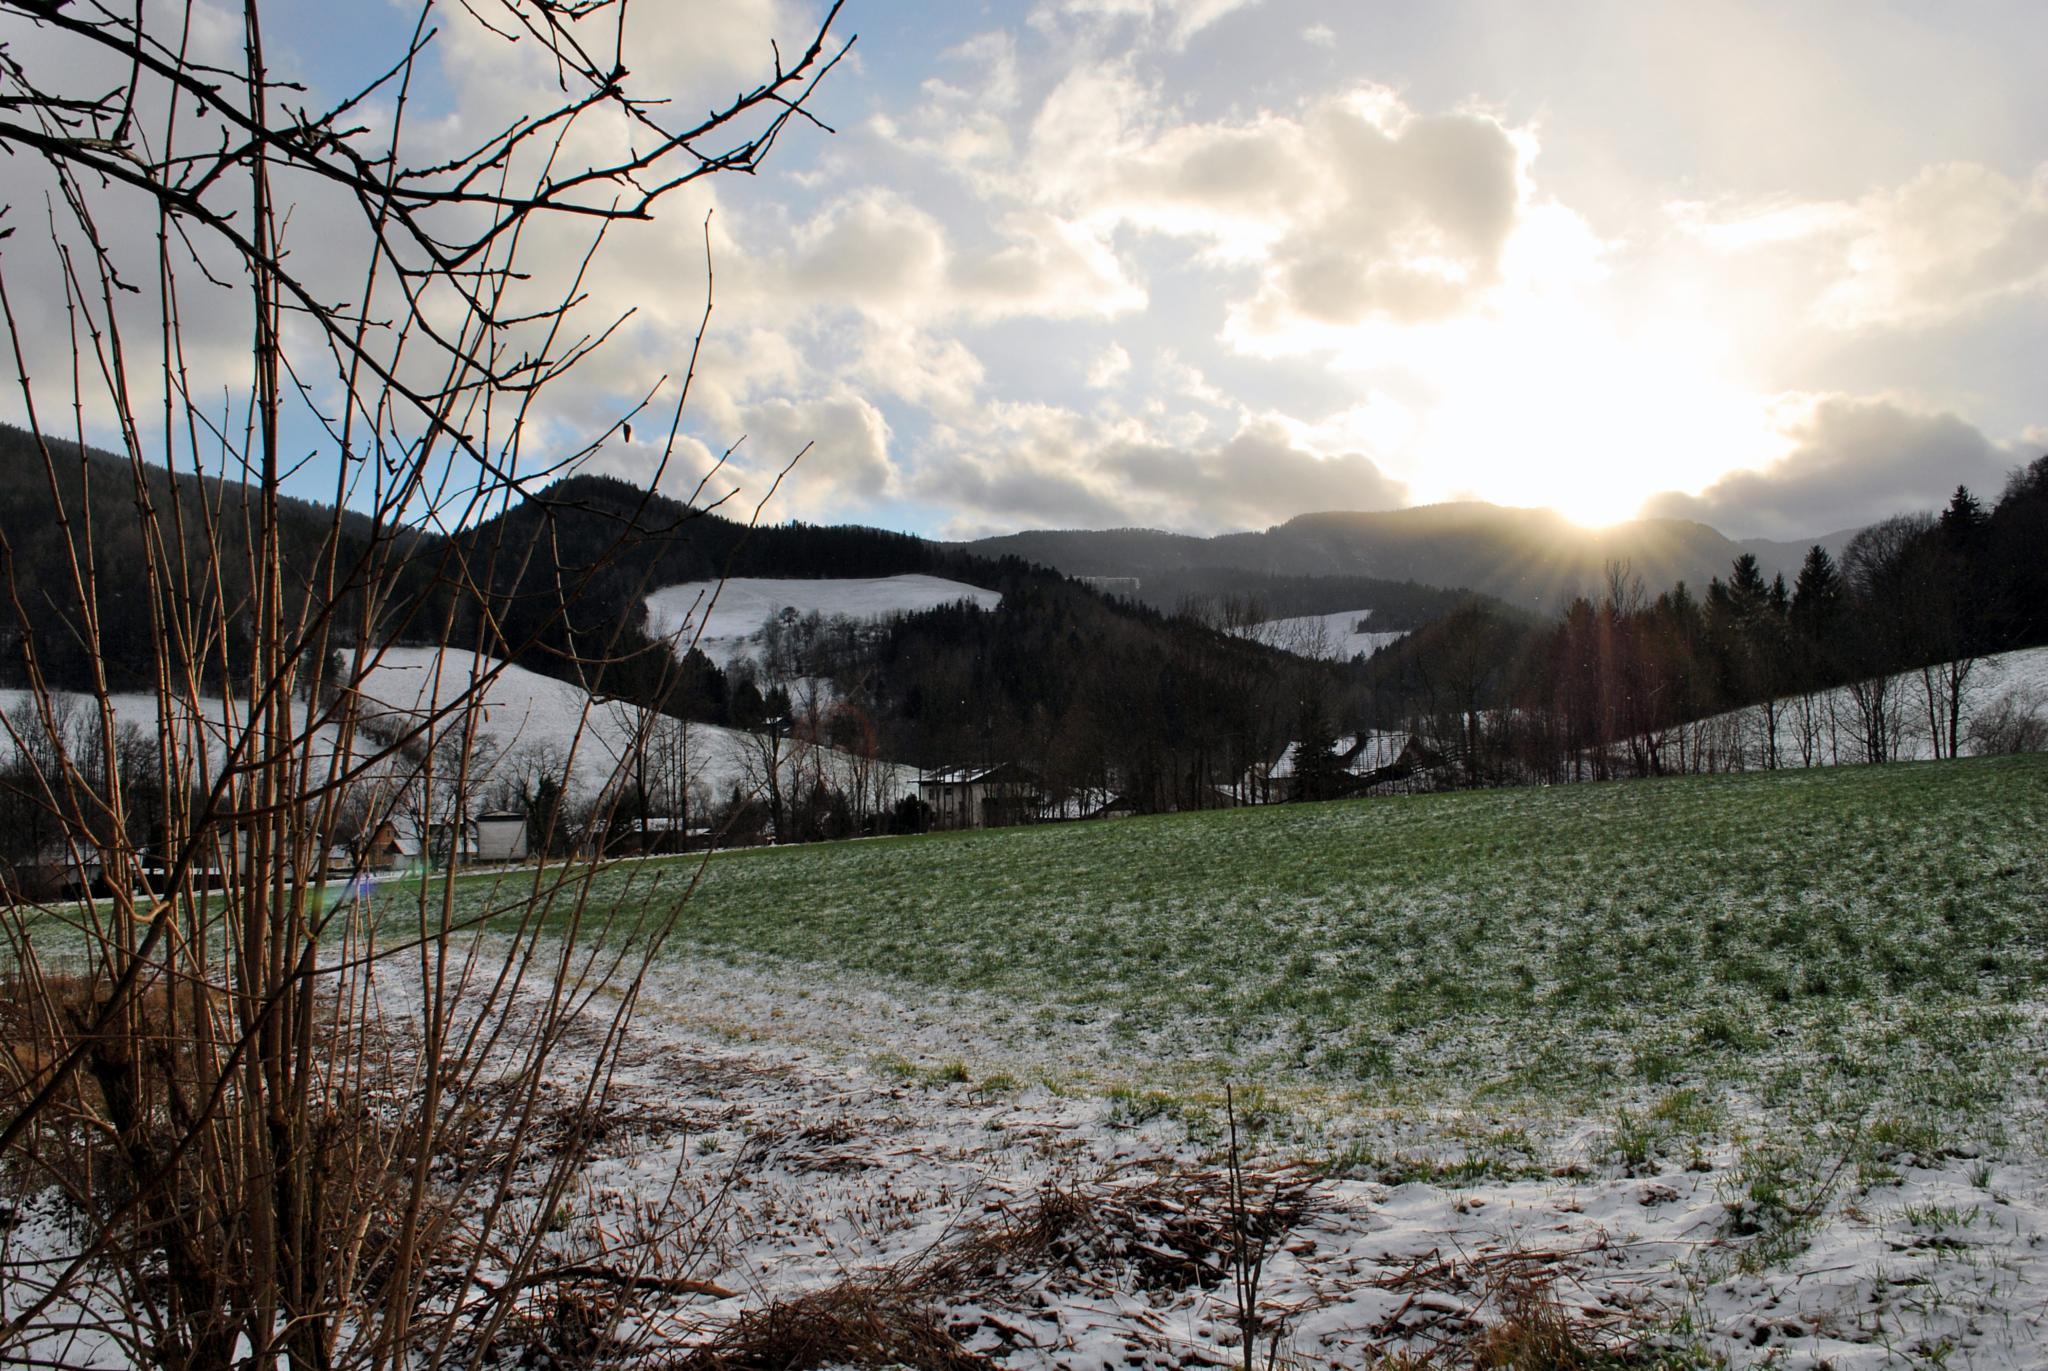 Sunny field in Rax region (Alps) by Nic Piégsa